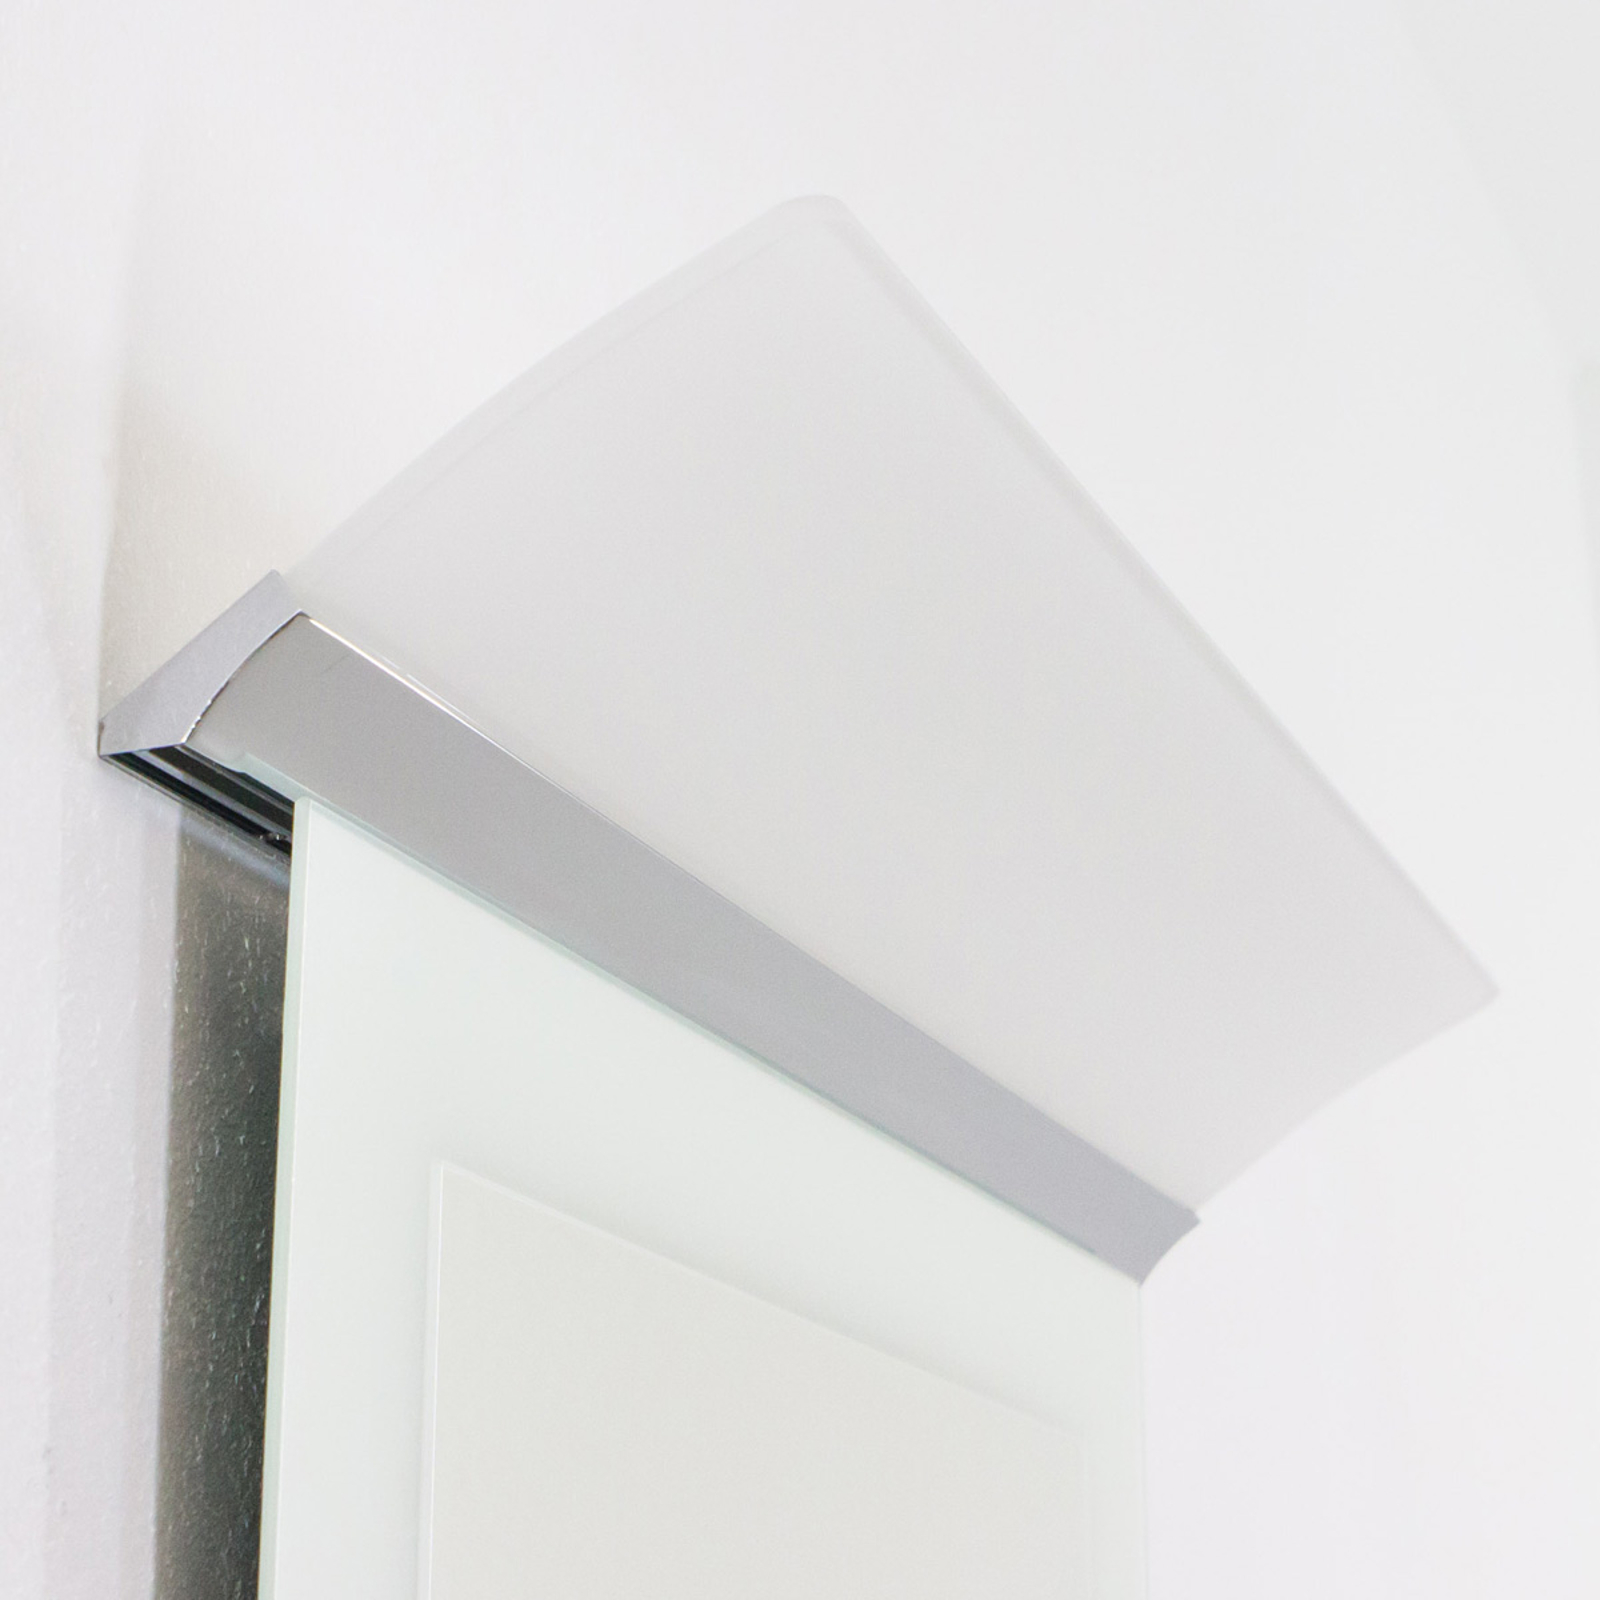 Plošné LED svítidlo nad zrcadlo Angela IP44, 50 cm